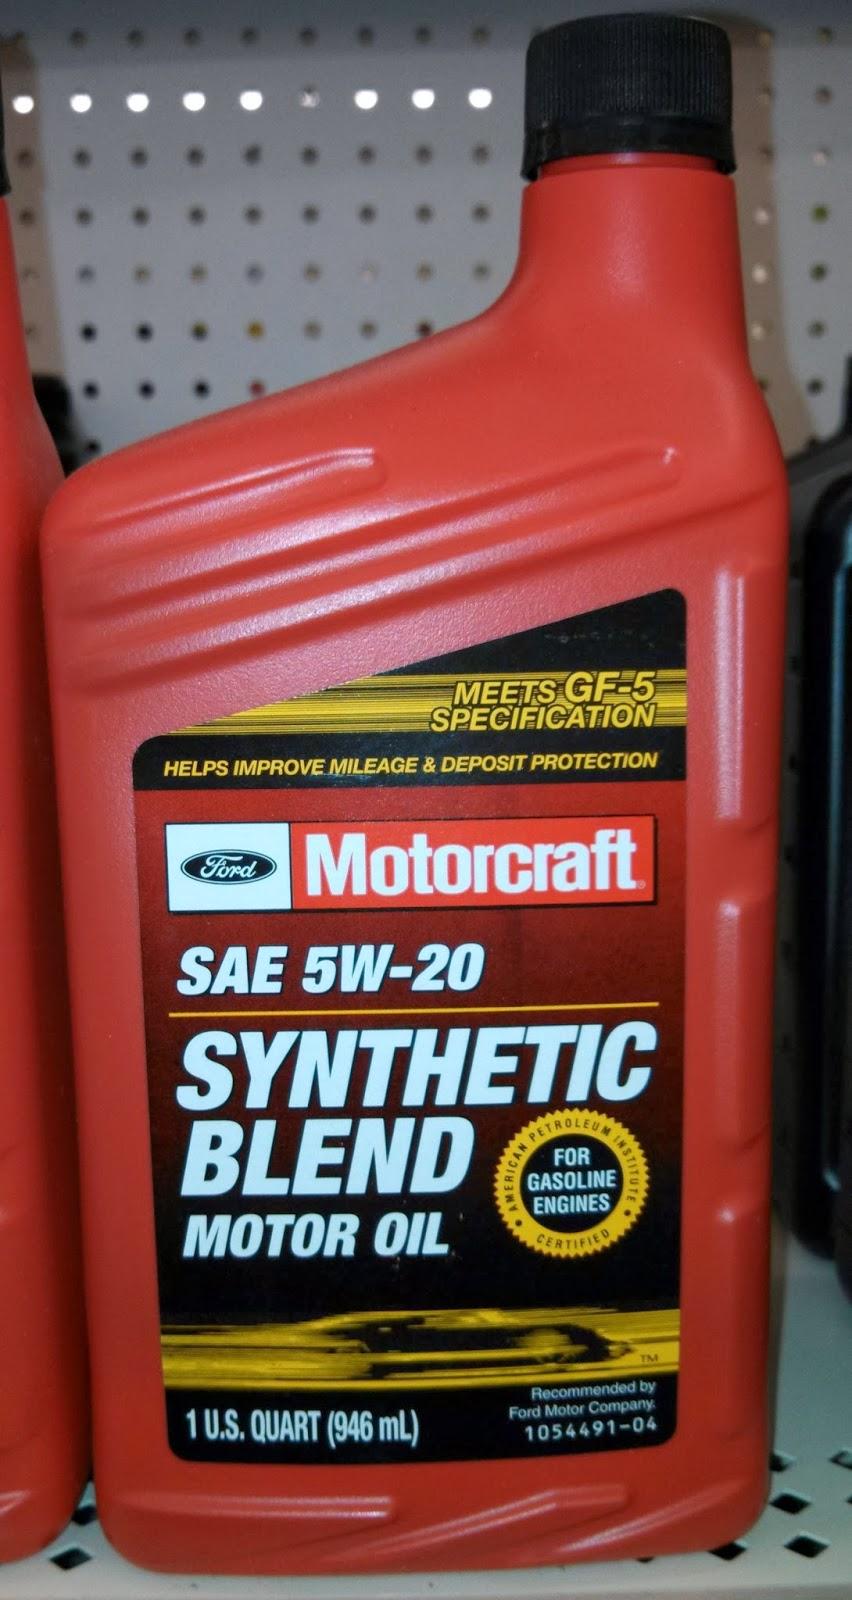 Synthetic oil vs regular oil penny pincher journal for Motorcraft synthetic blend motor oil